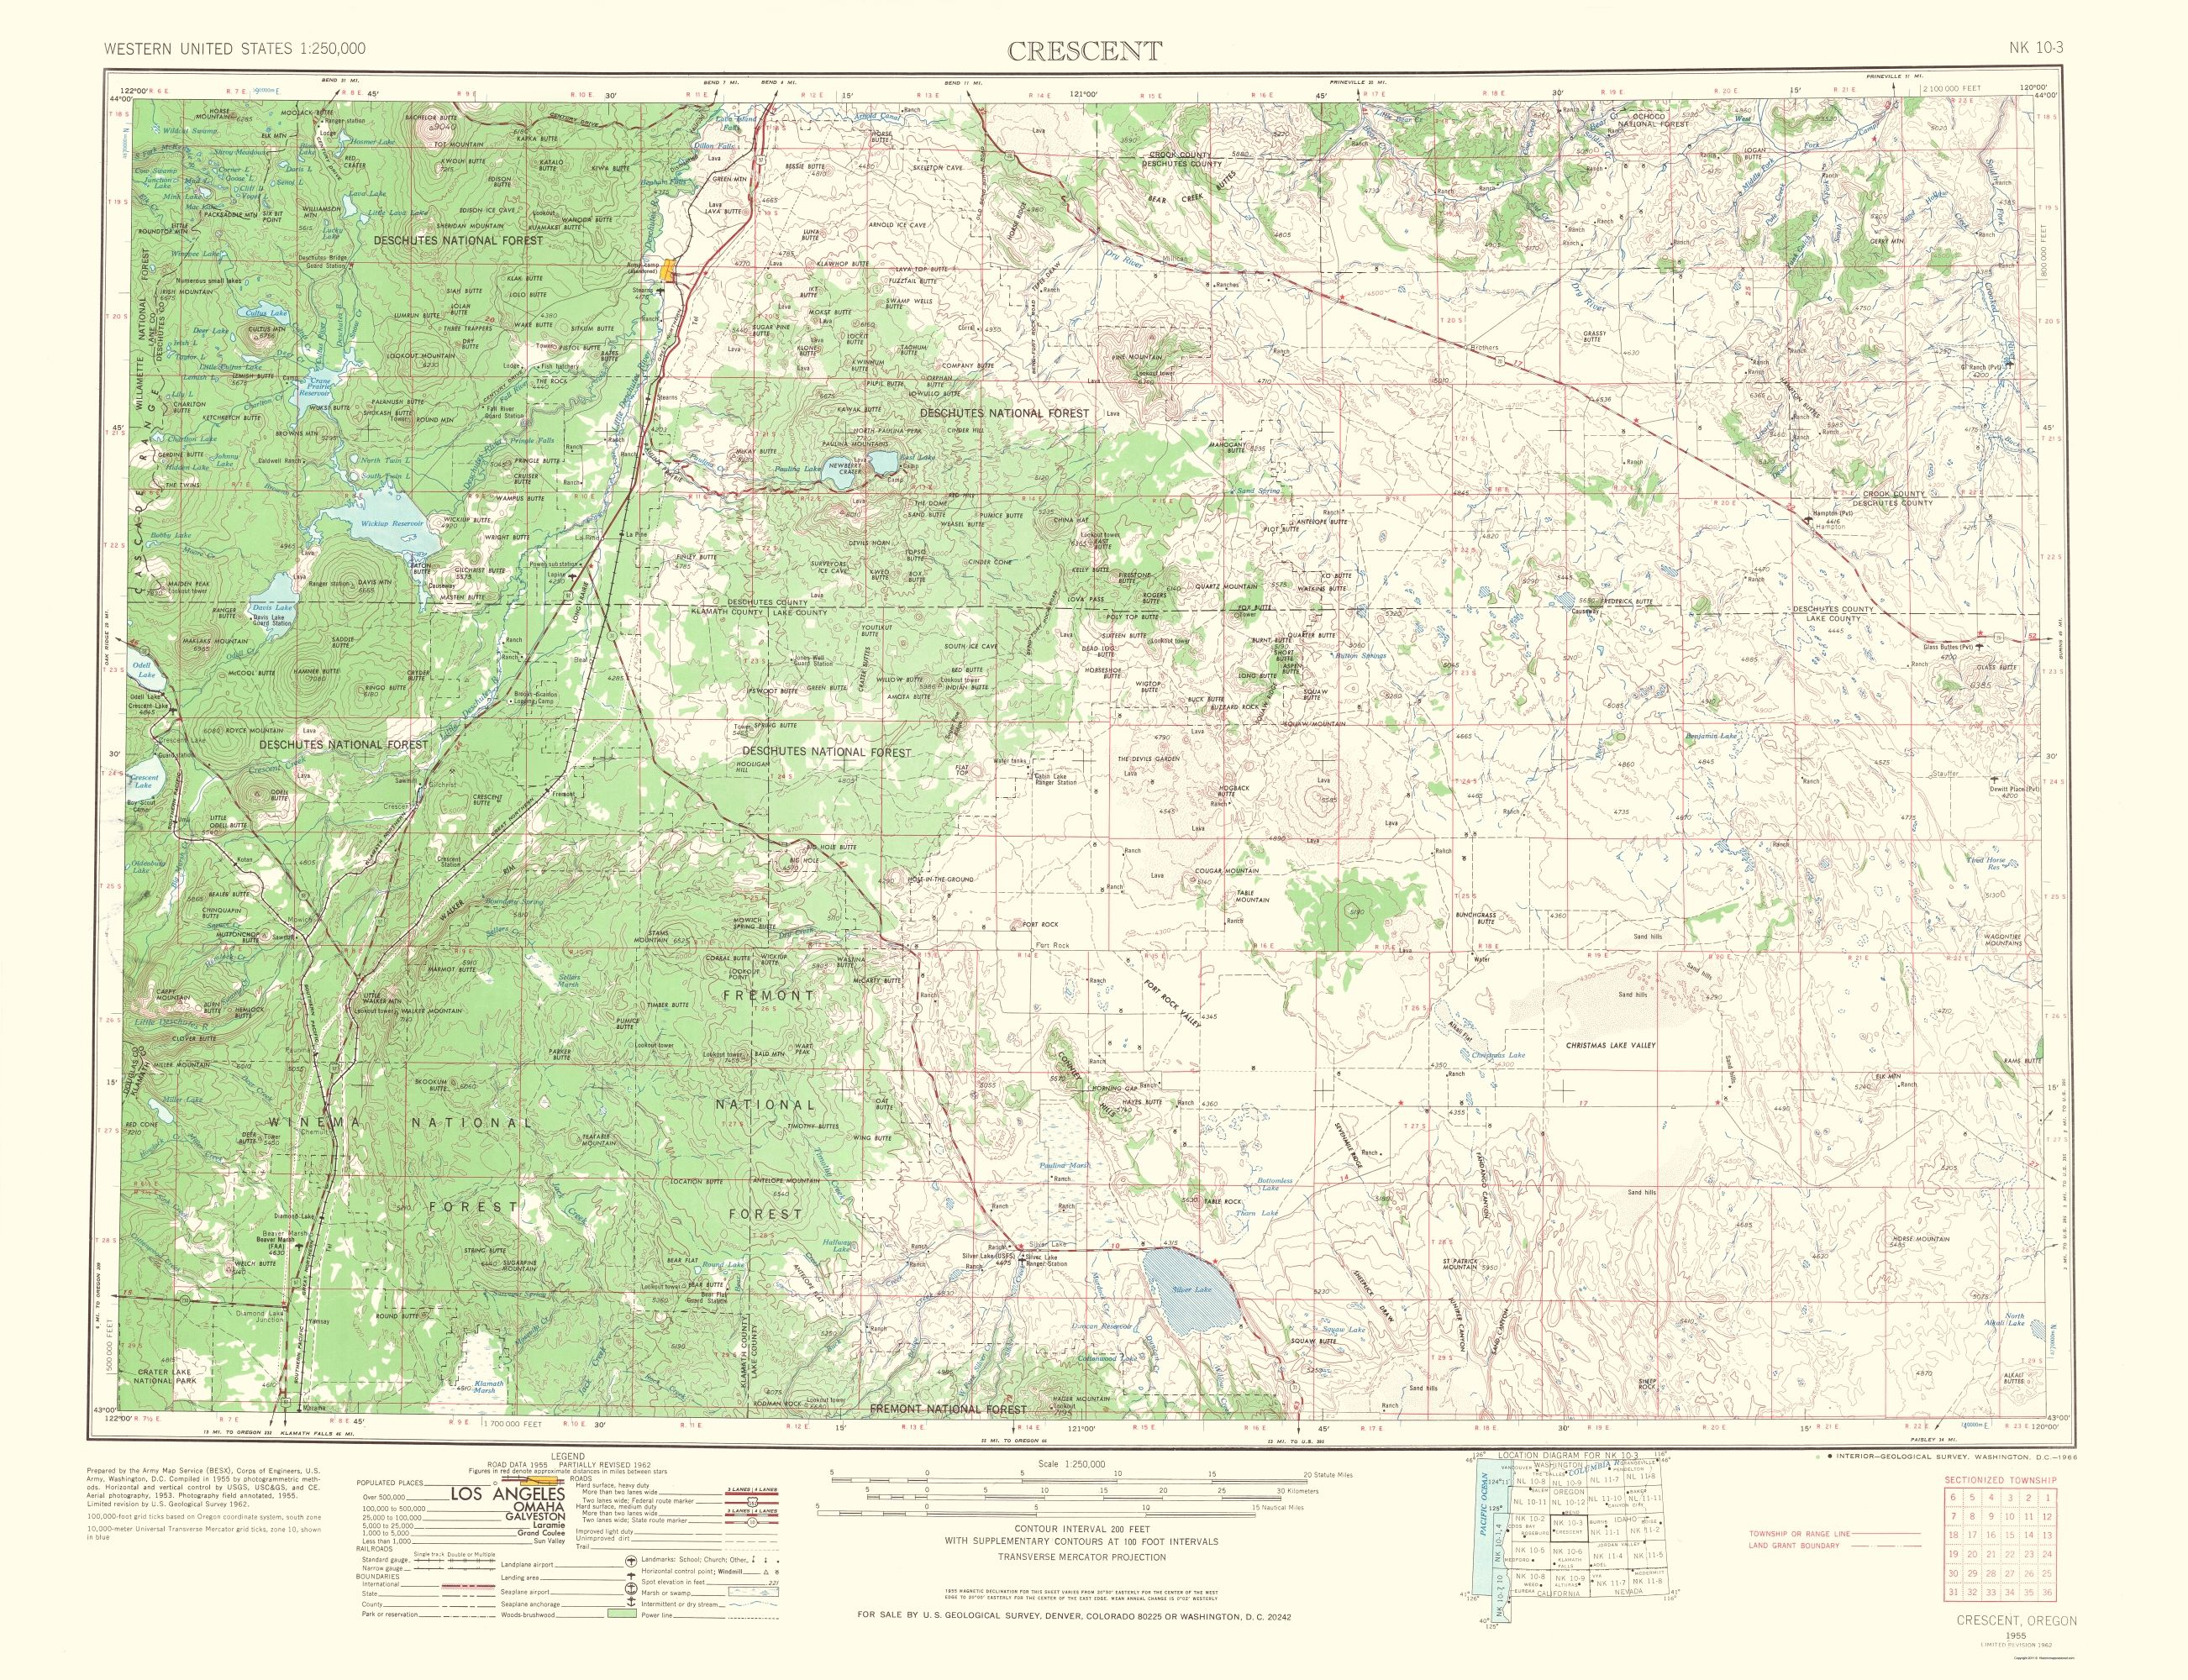 Topographical Map Print Crescent Oregon Usgs 1966 23 X 29 94